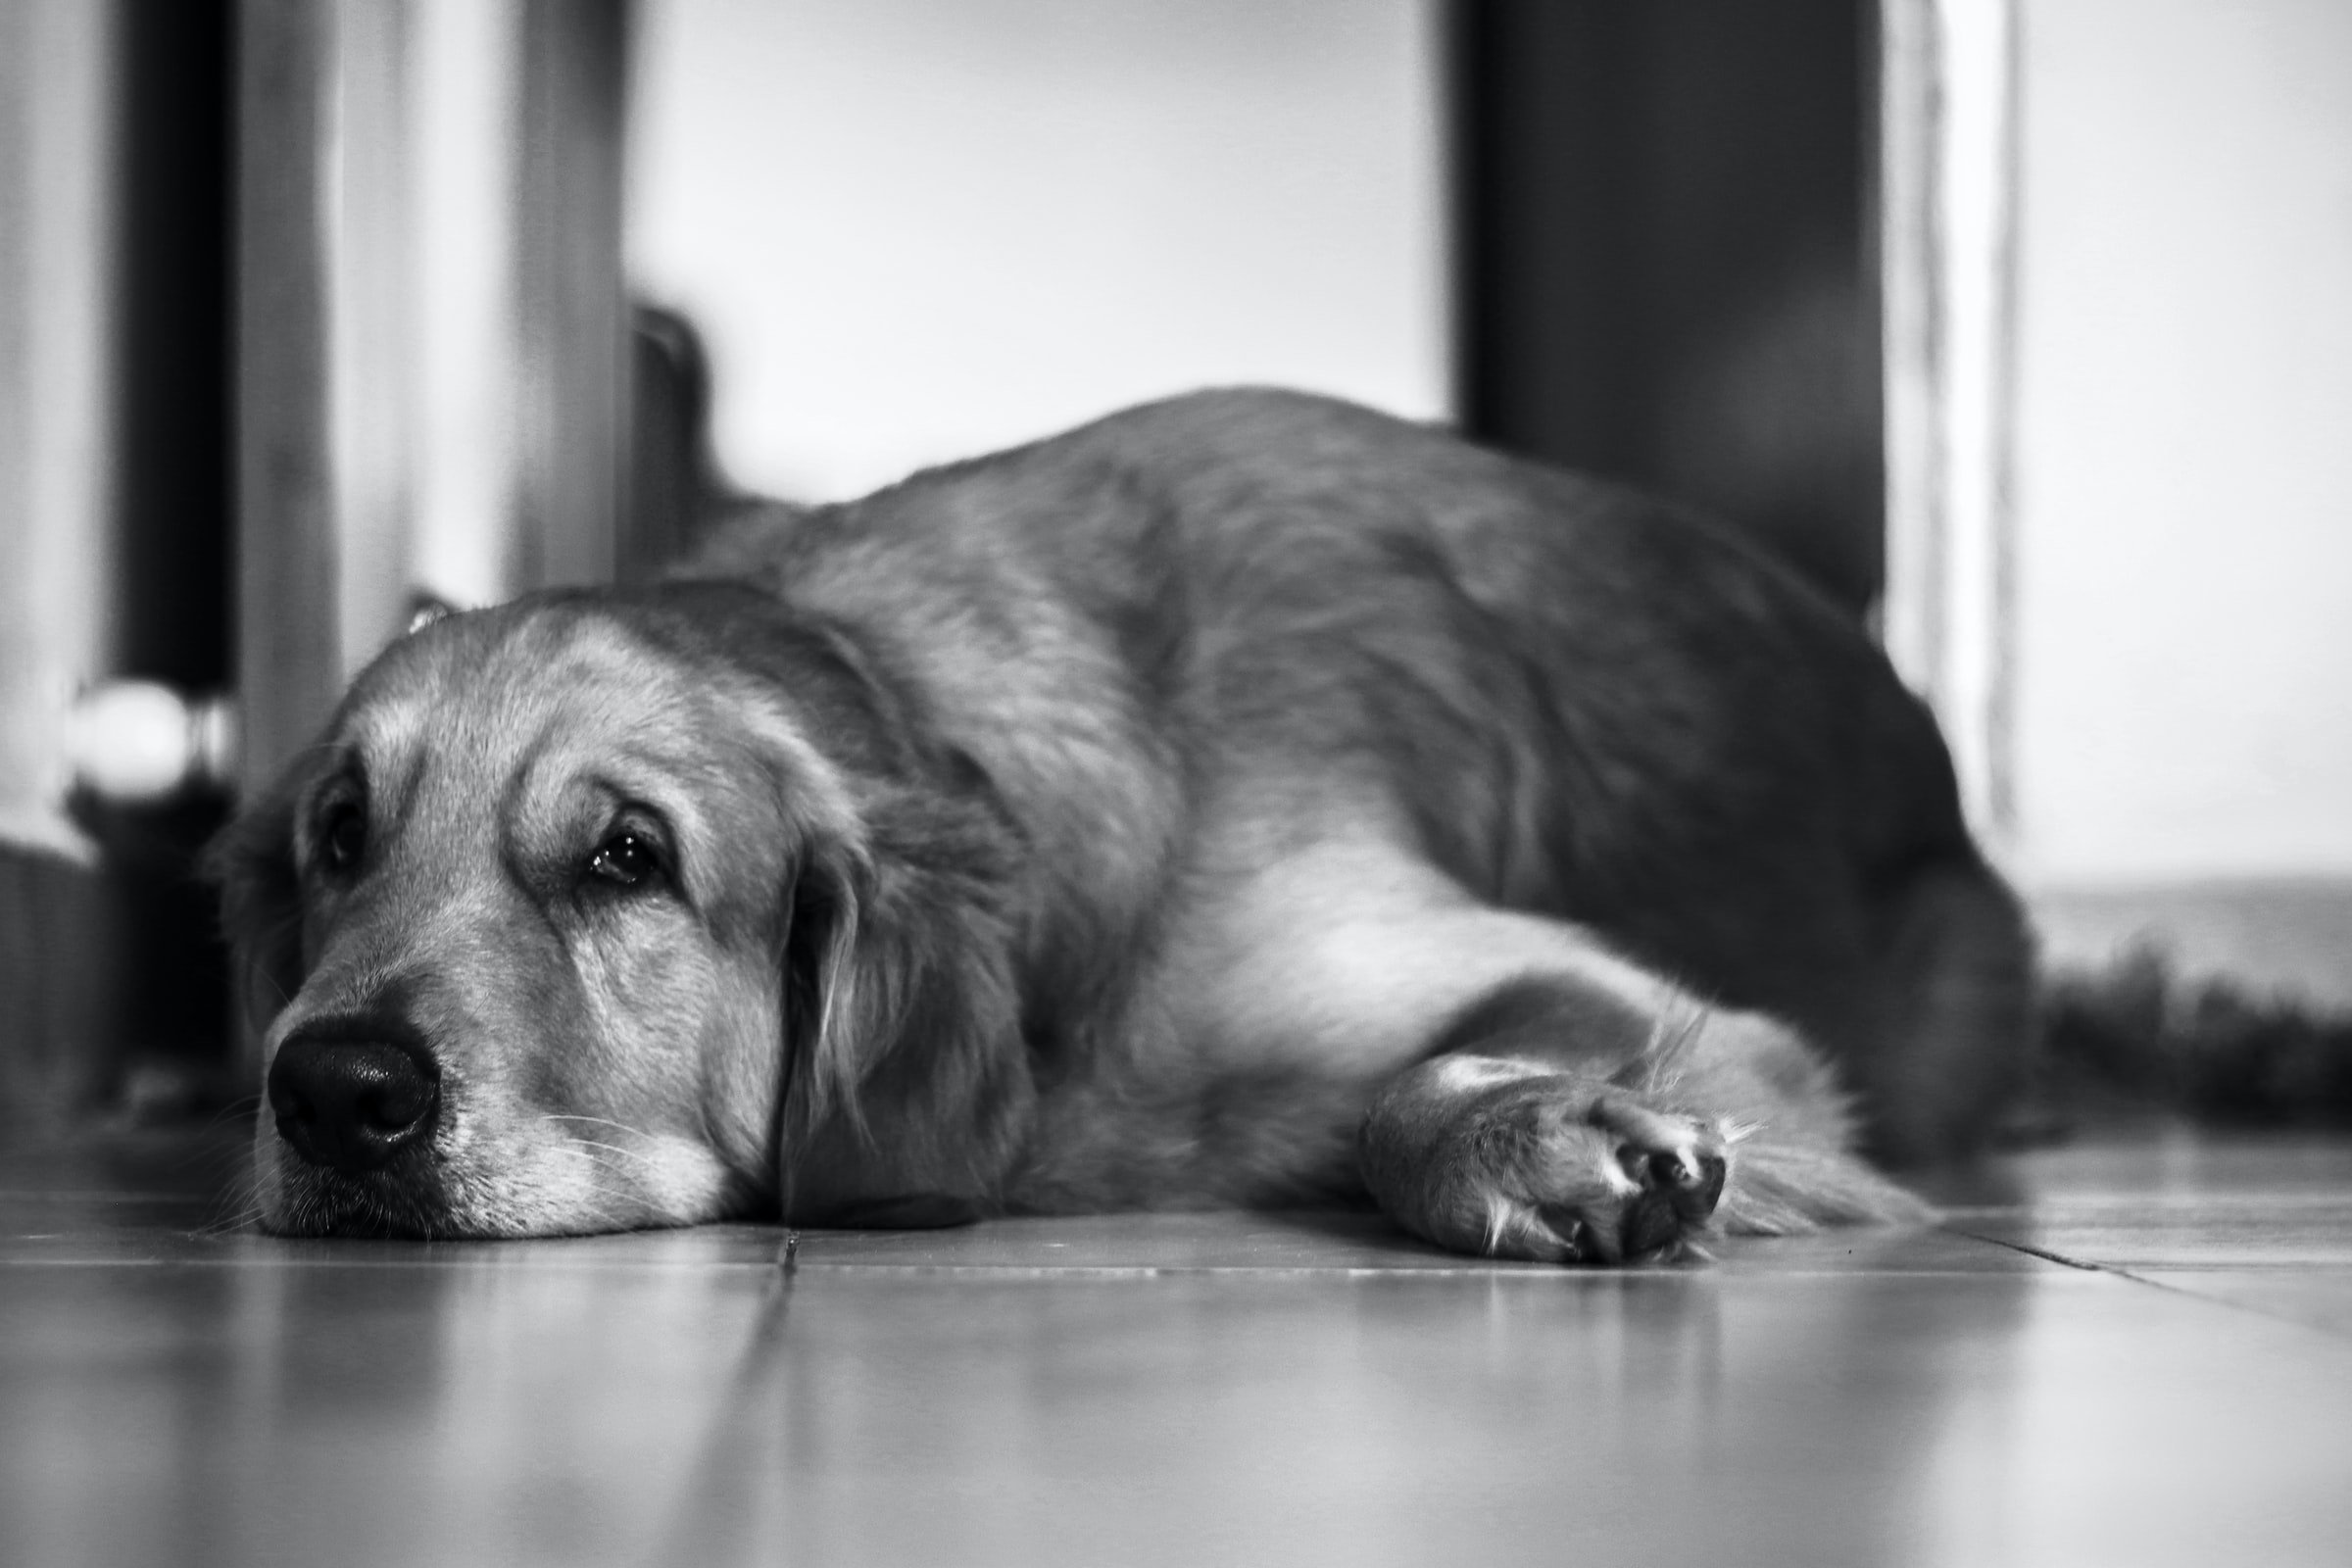 old dog lying down